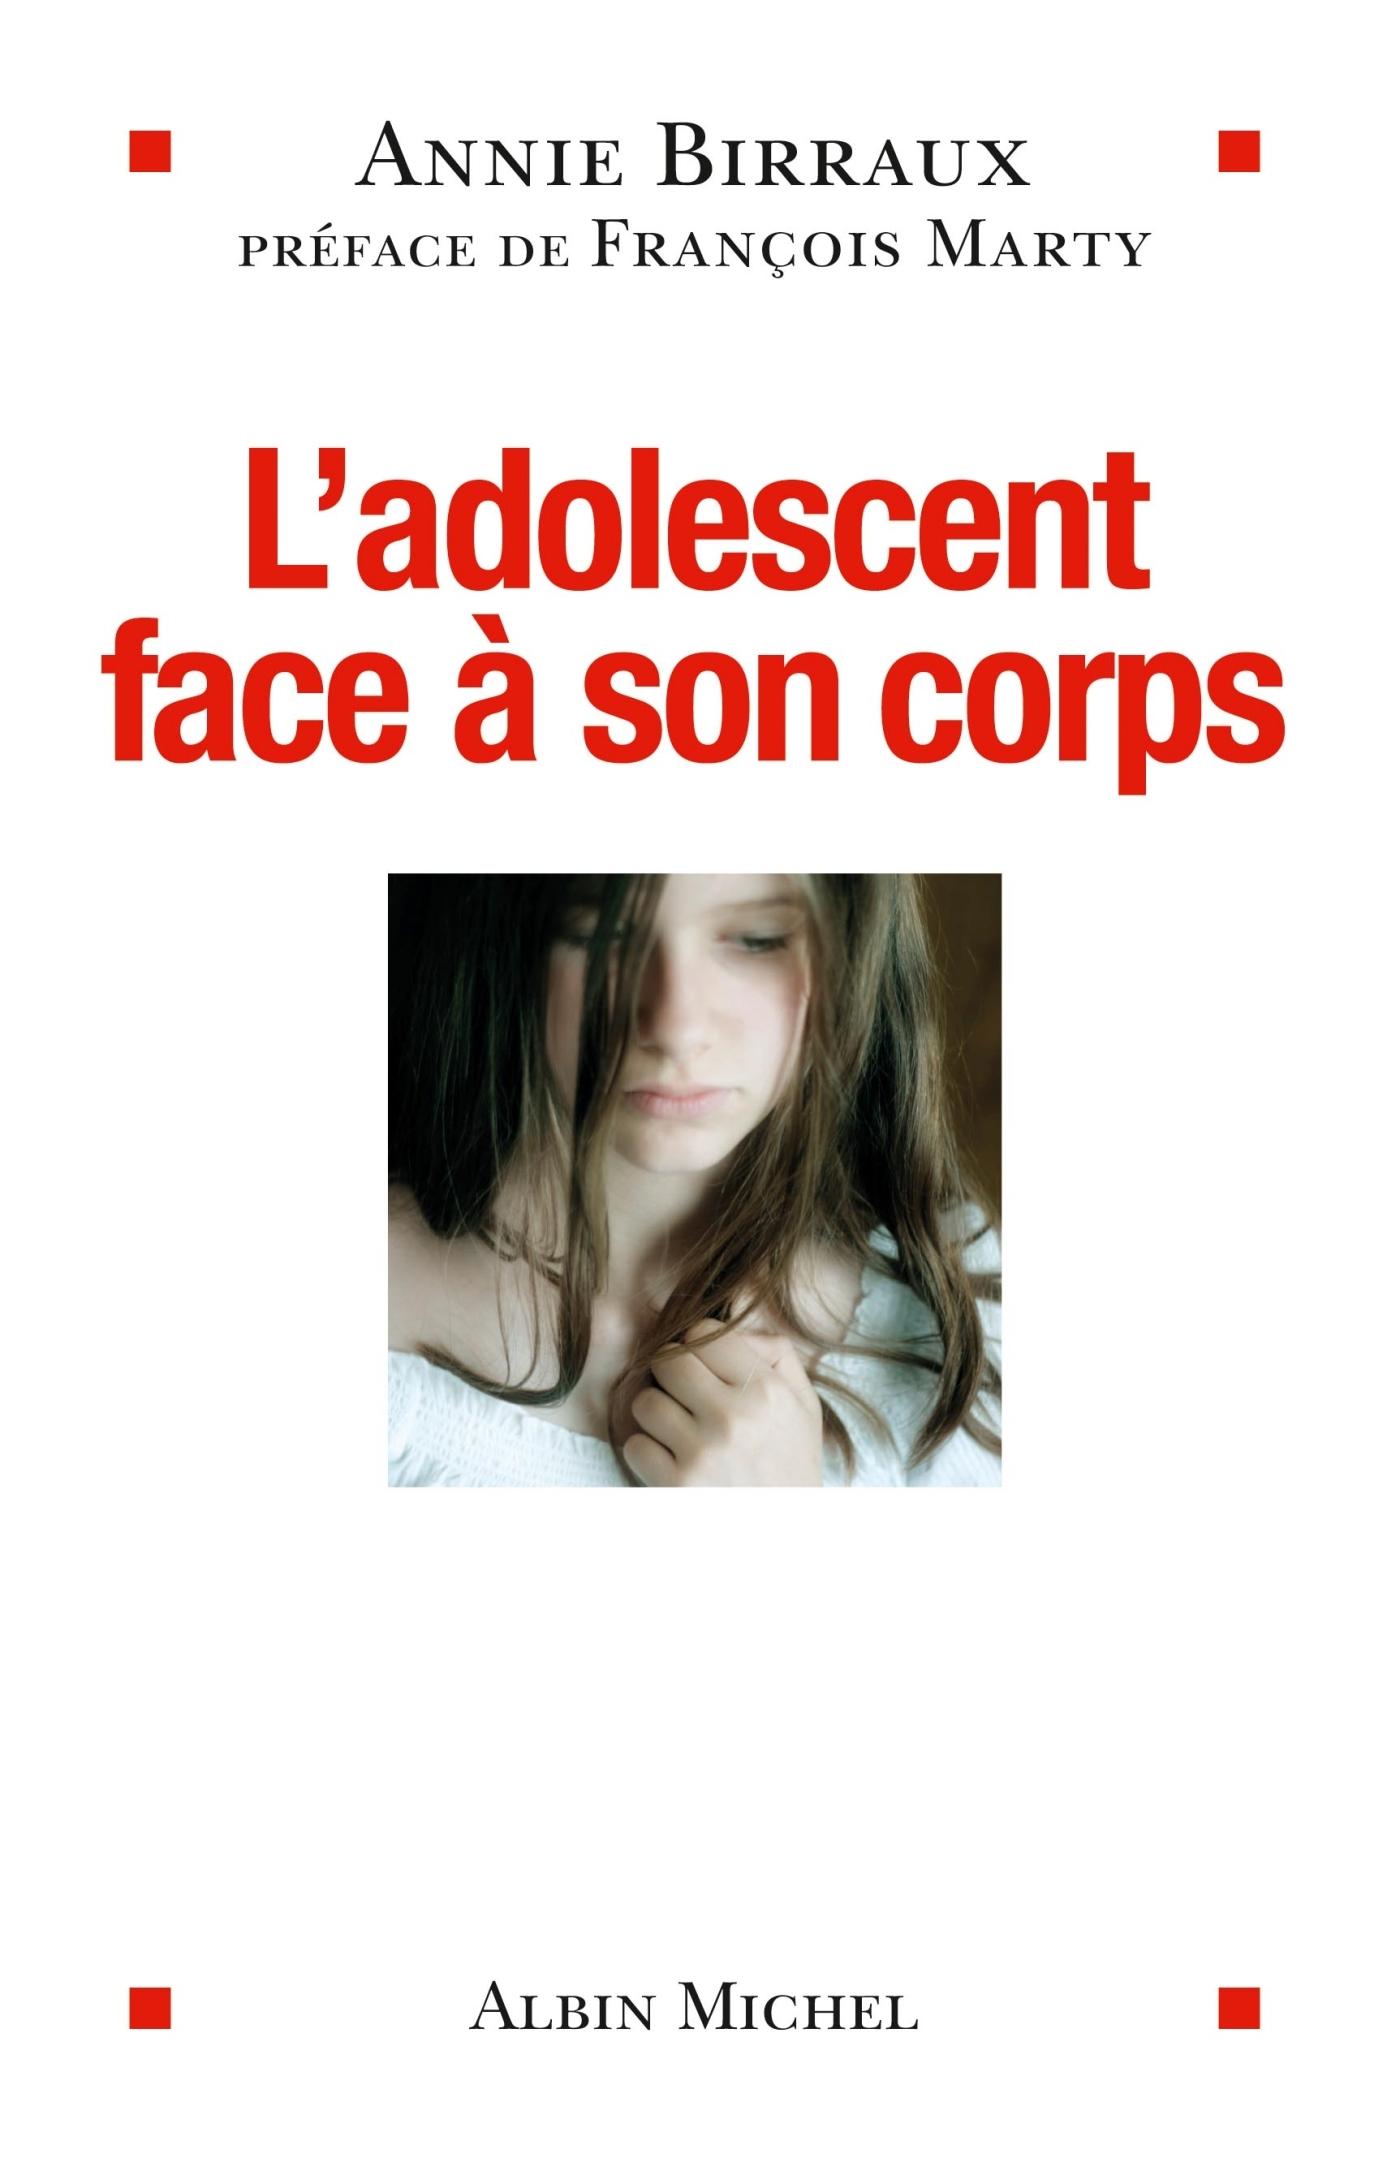 L'ADOLESCENT FACE A SON CORPS